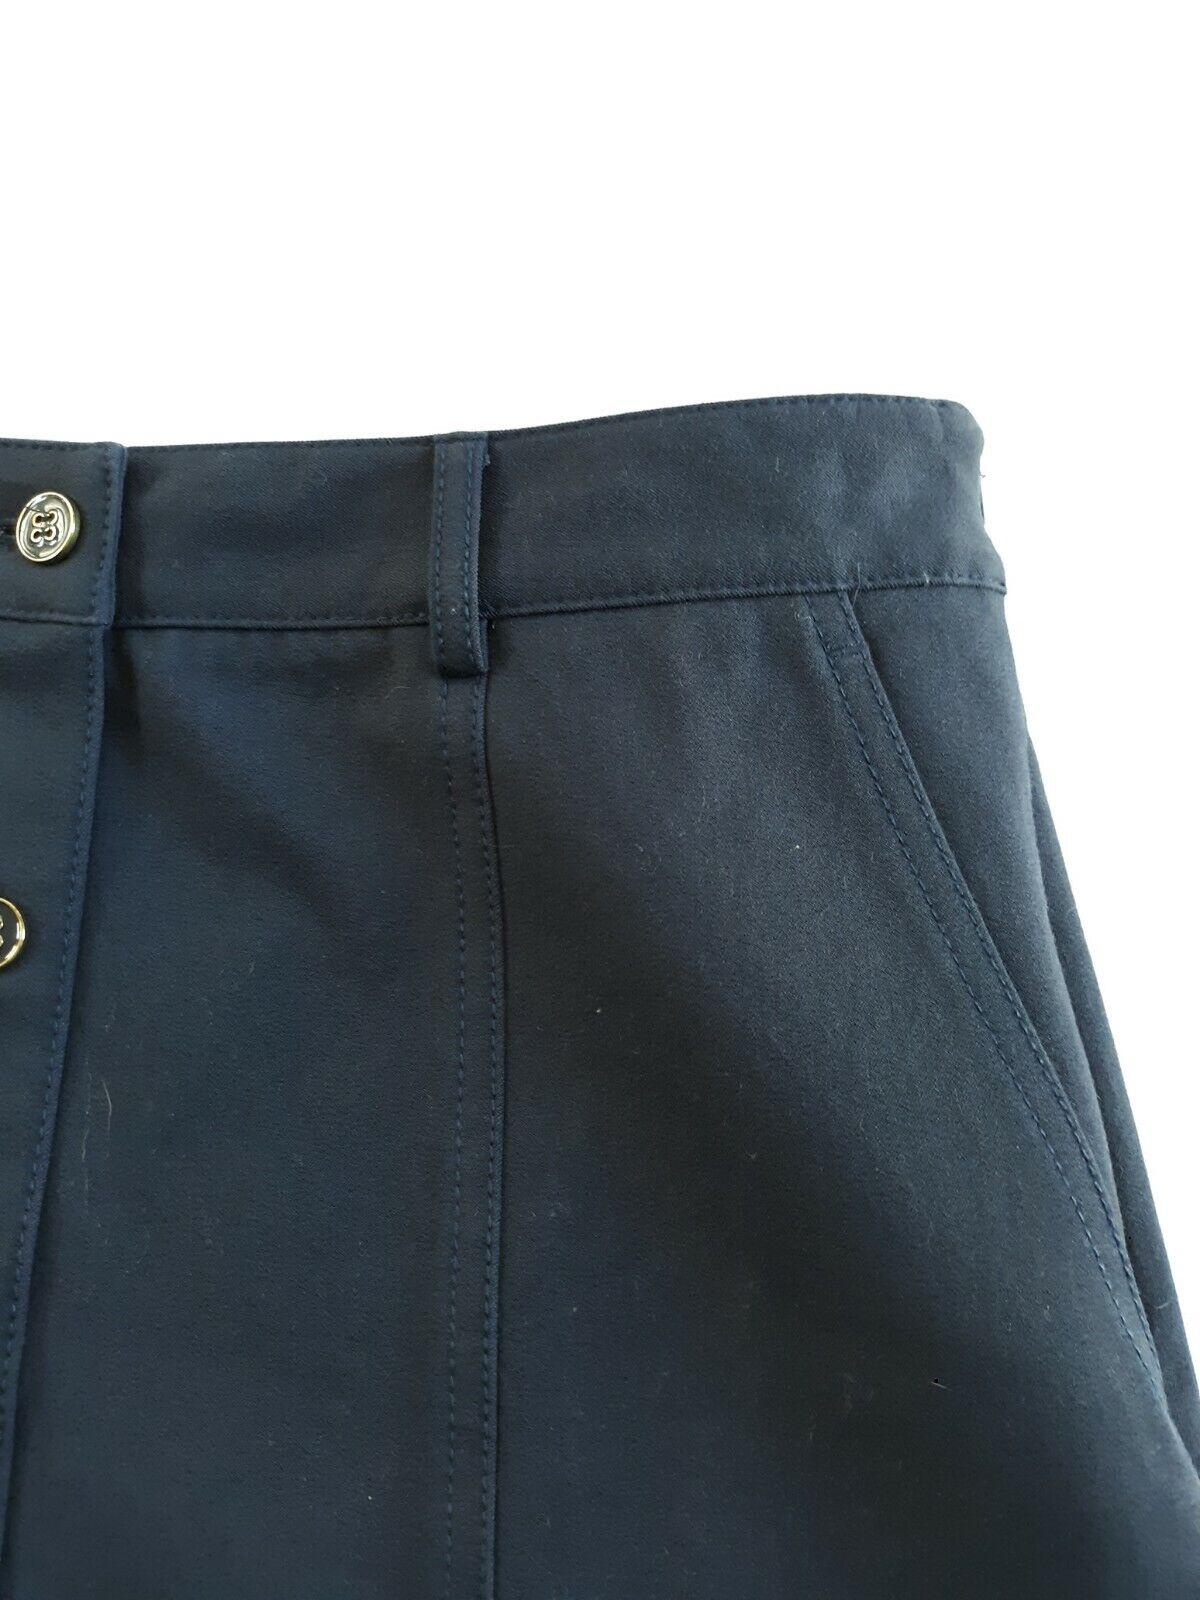 J McLaughlin Teal Button Front A Line Skirt Size 2 - image 9